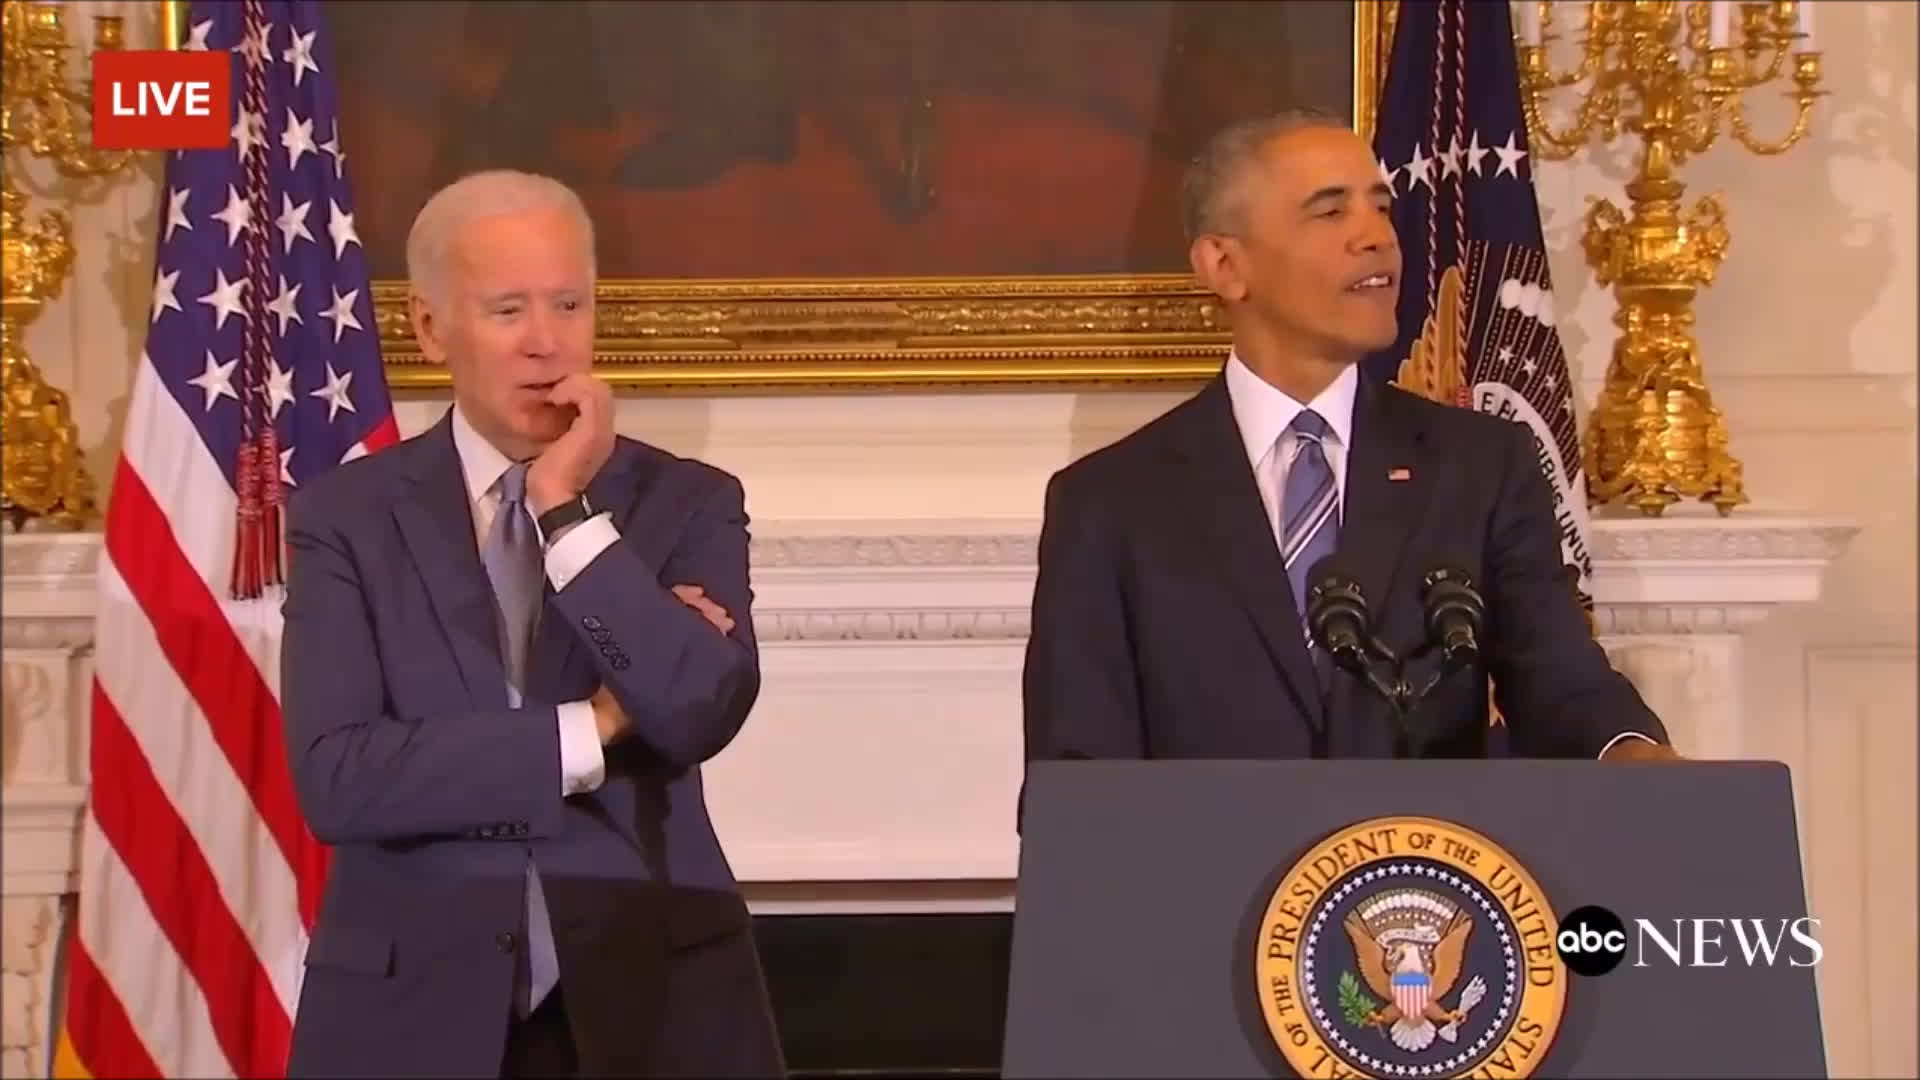 JoeBiden, unclejoe, vicepresident, Joe Biden 2017 GIFs